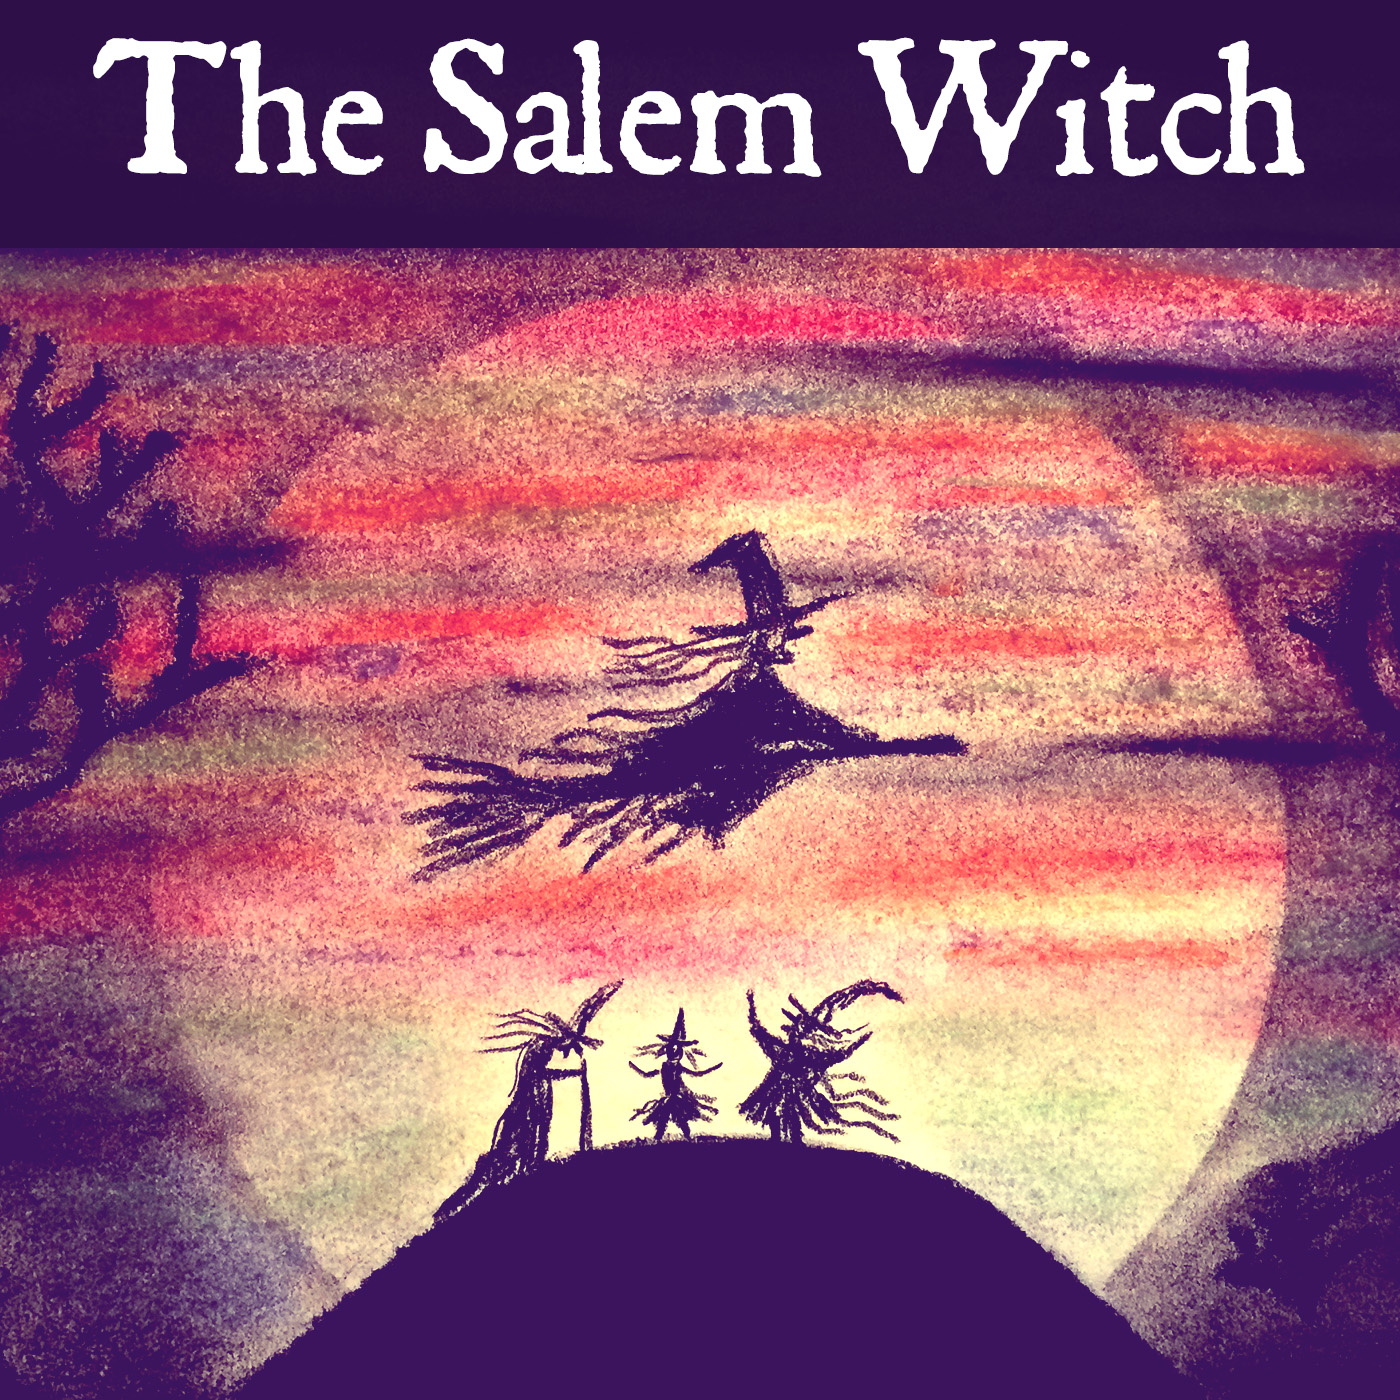 the-salem-witch-podcast-artwork-02